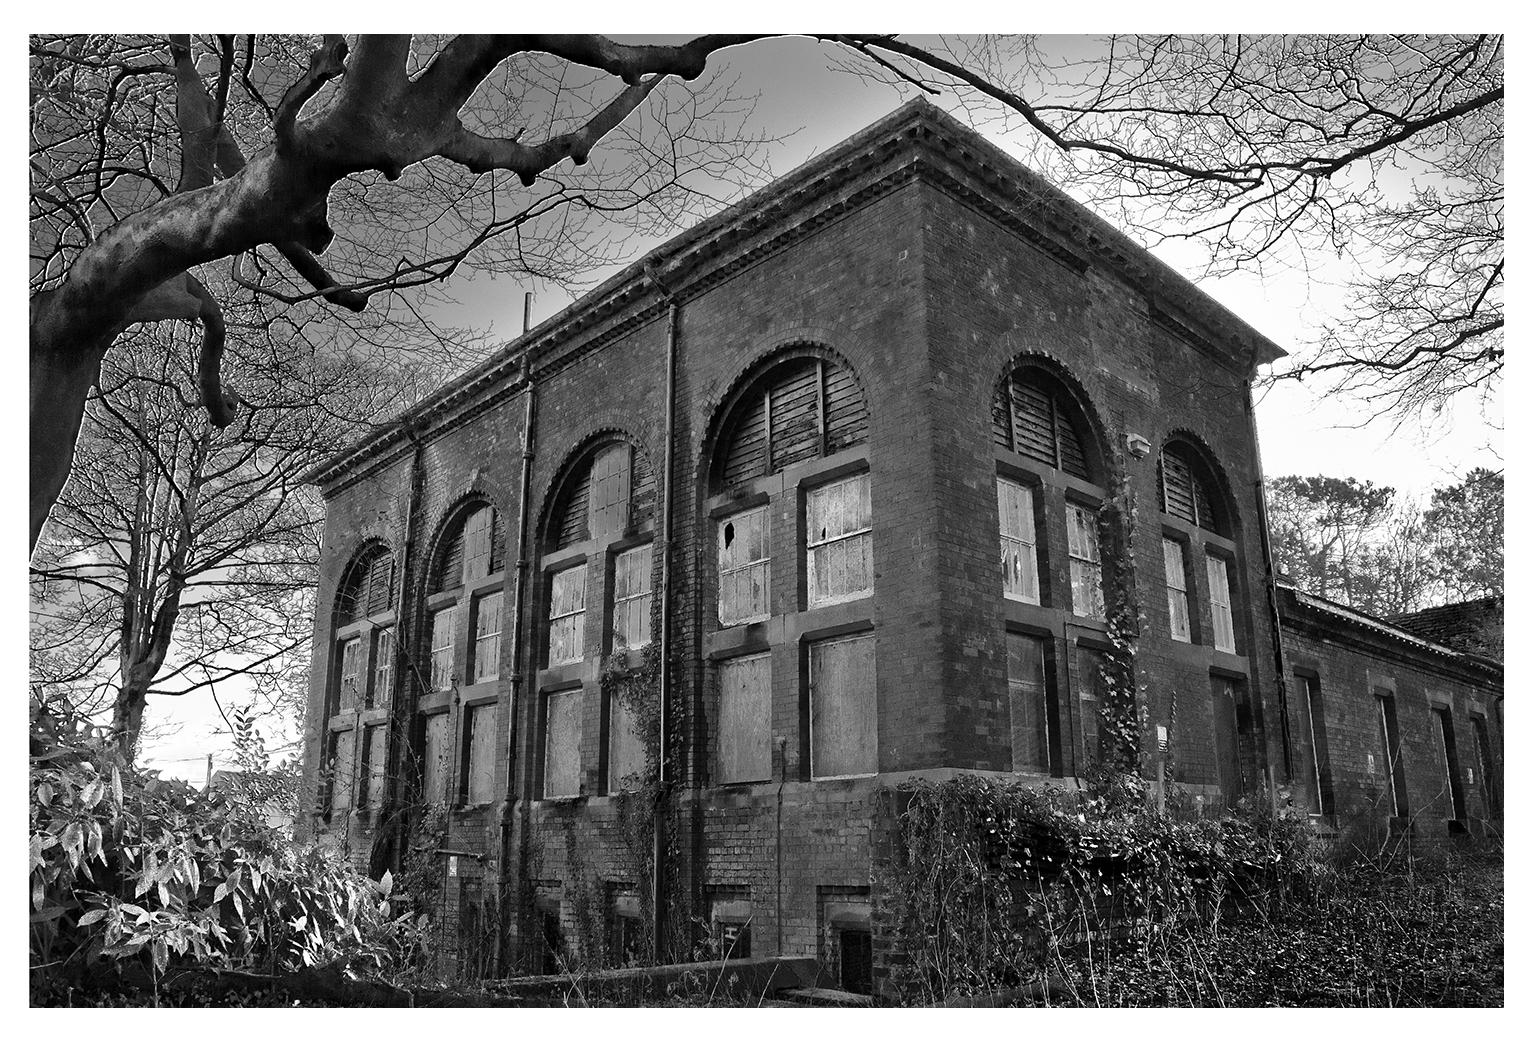 Whittingham Lunatic Asylum I